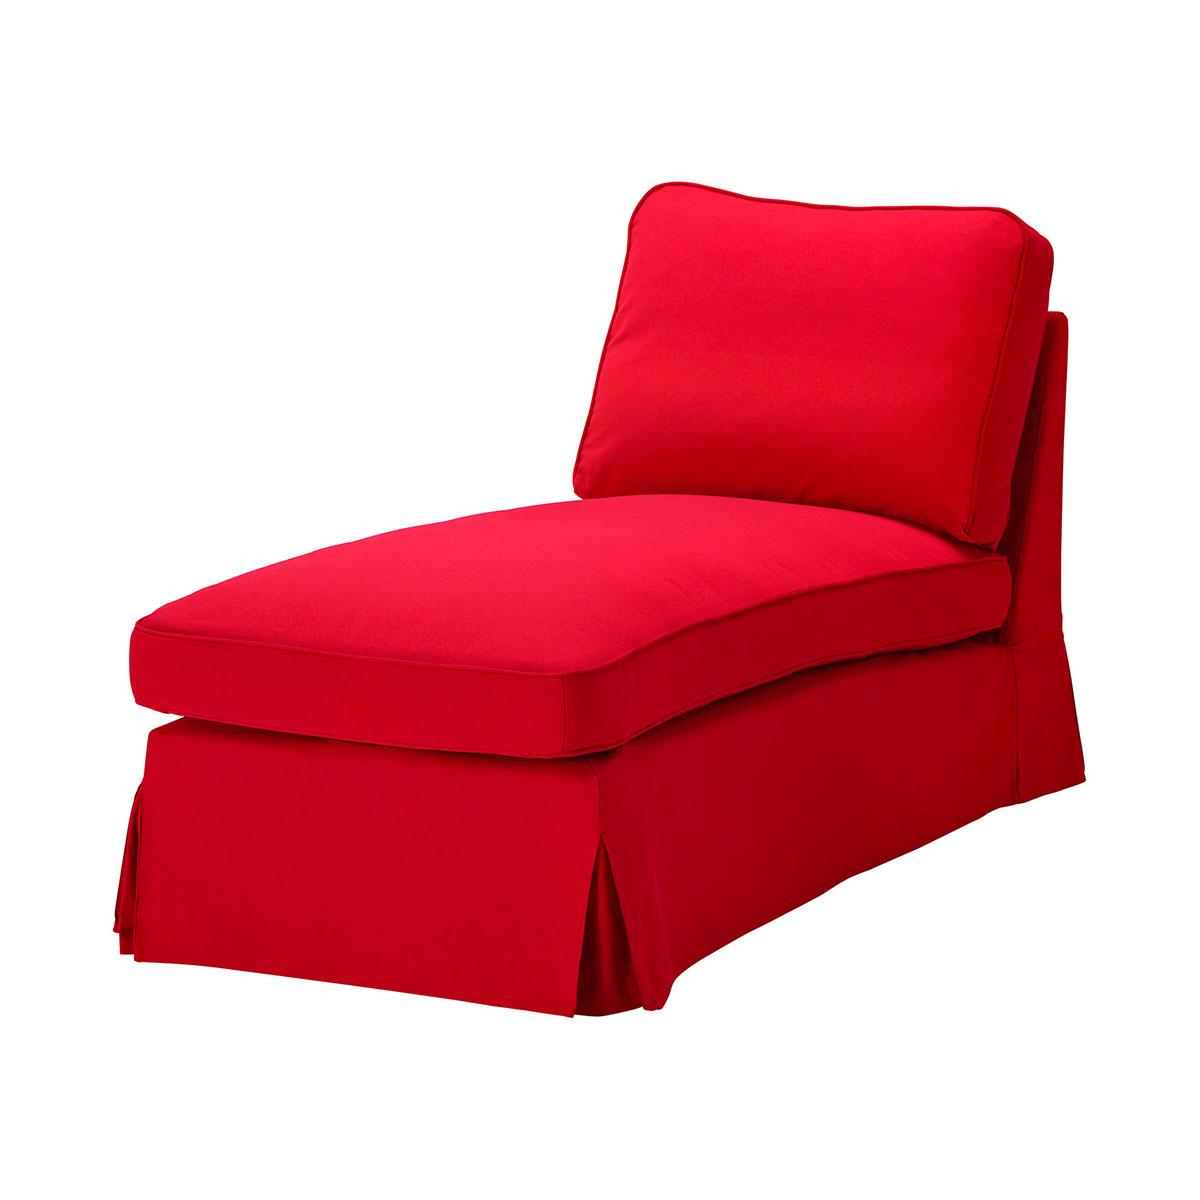 Chaise longue cre show for Dimension chaise longue